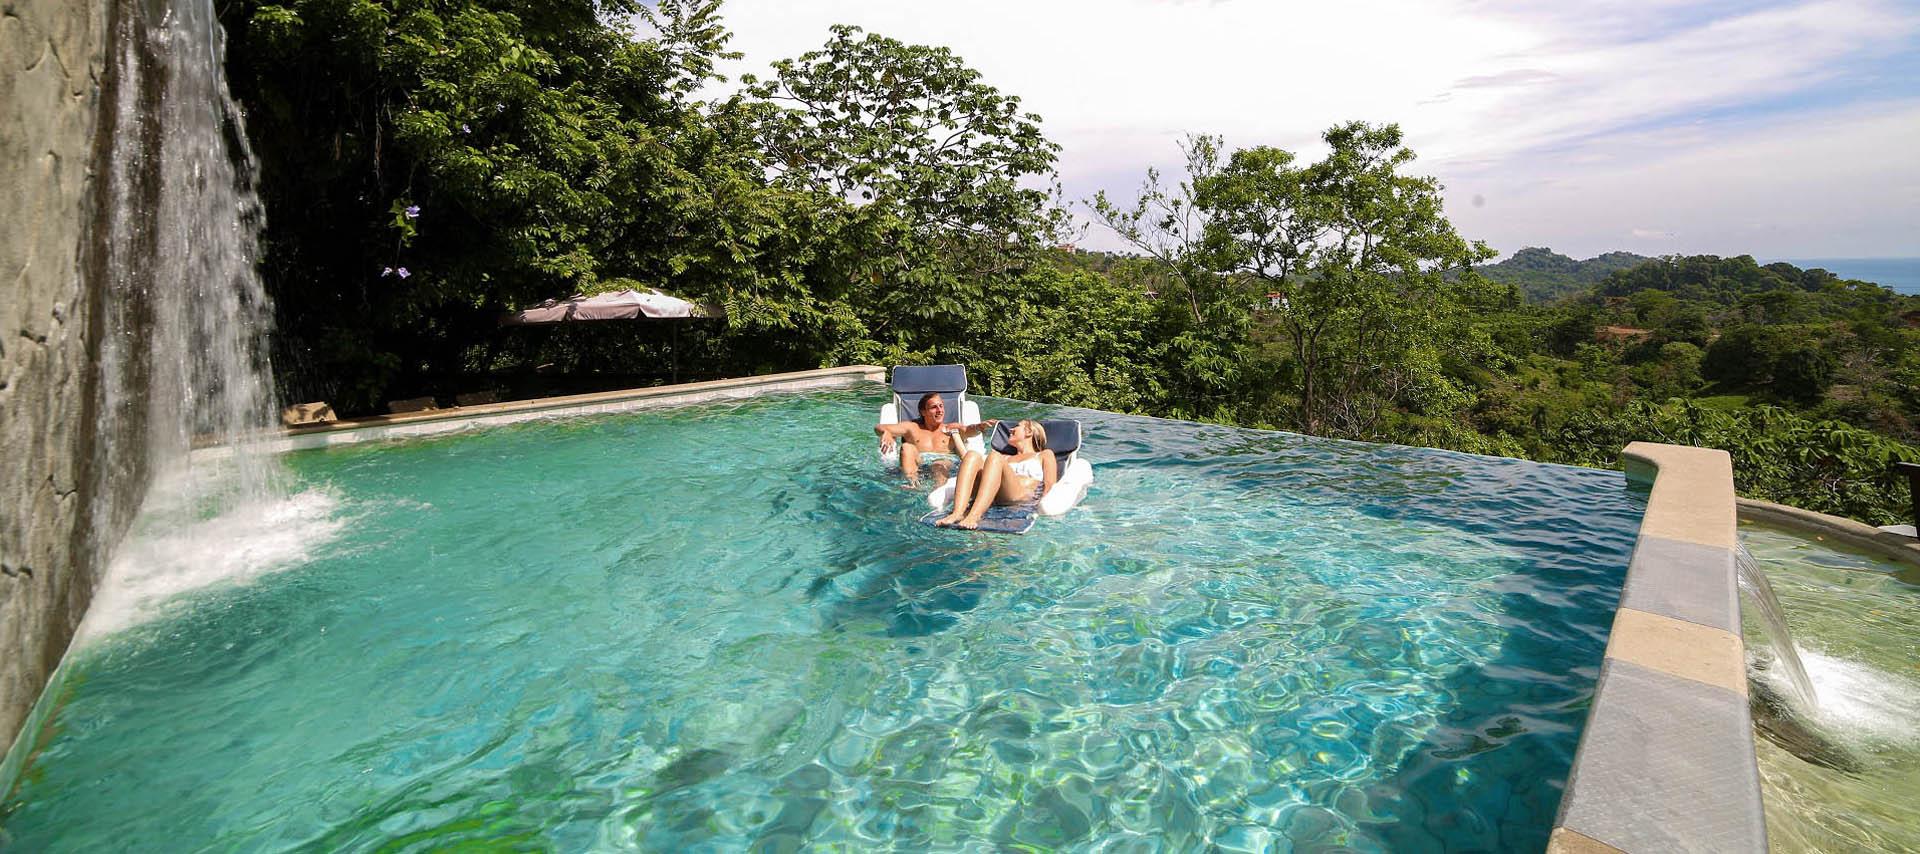 Gaia boutique hotel Manuel Antonio Costa Rica & luxury boutique hotels